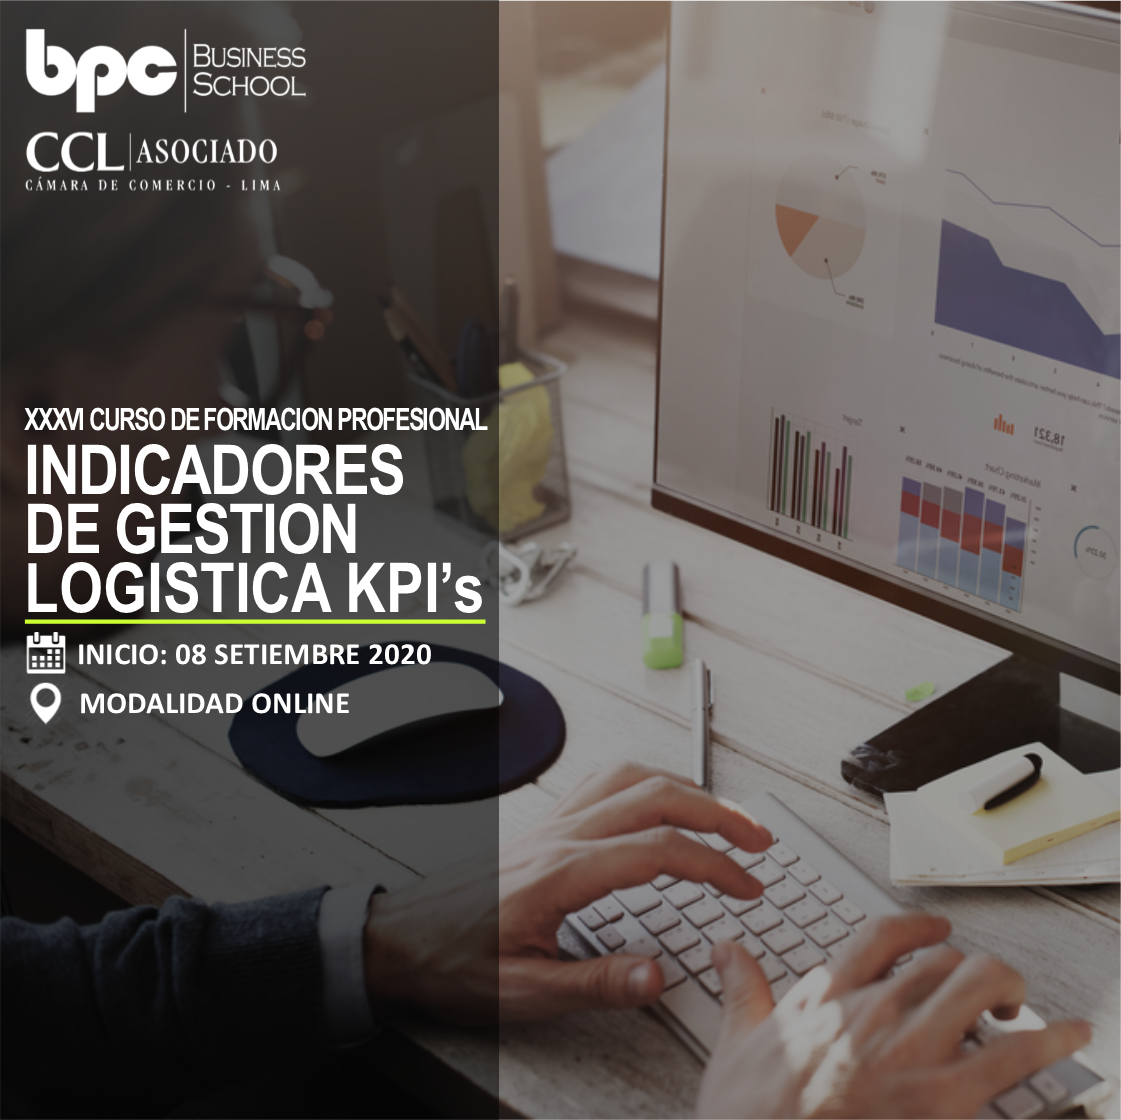 XXXVI Curso de Indicadores de Gestión Logística KPI's